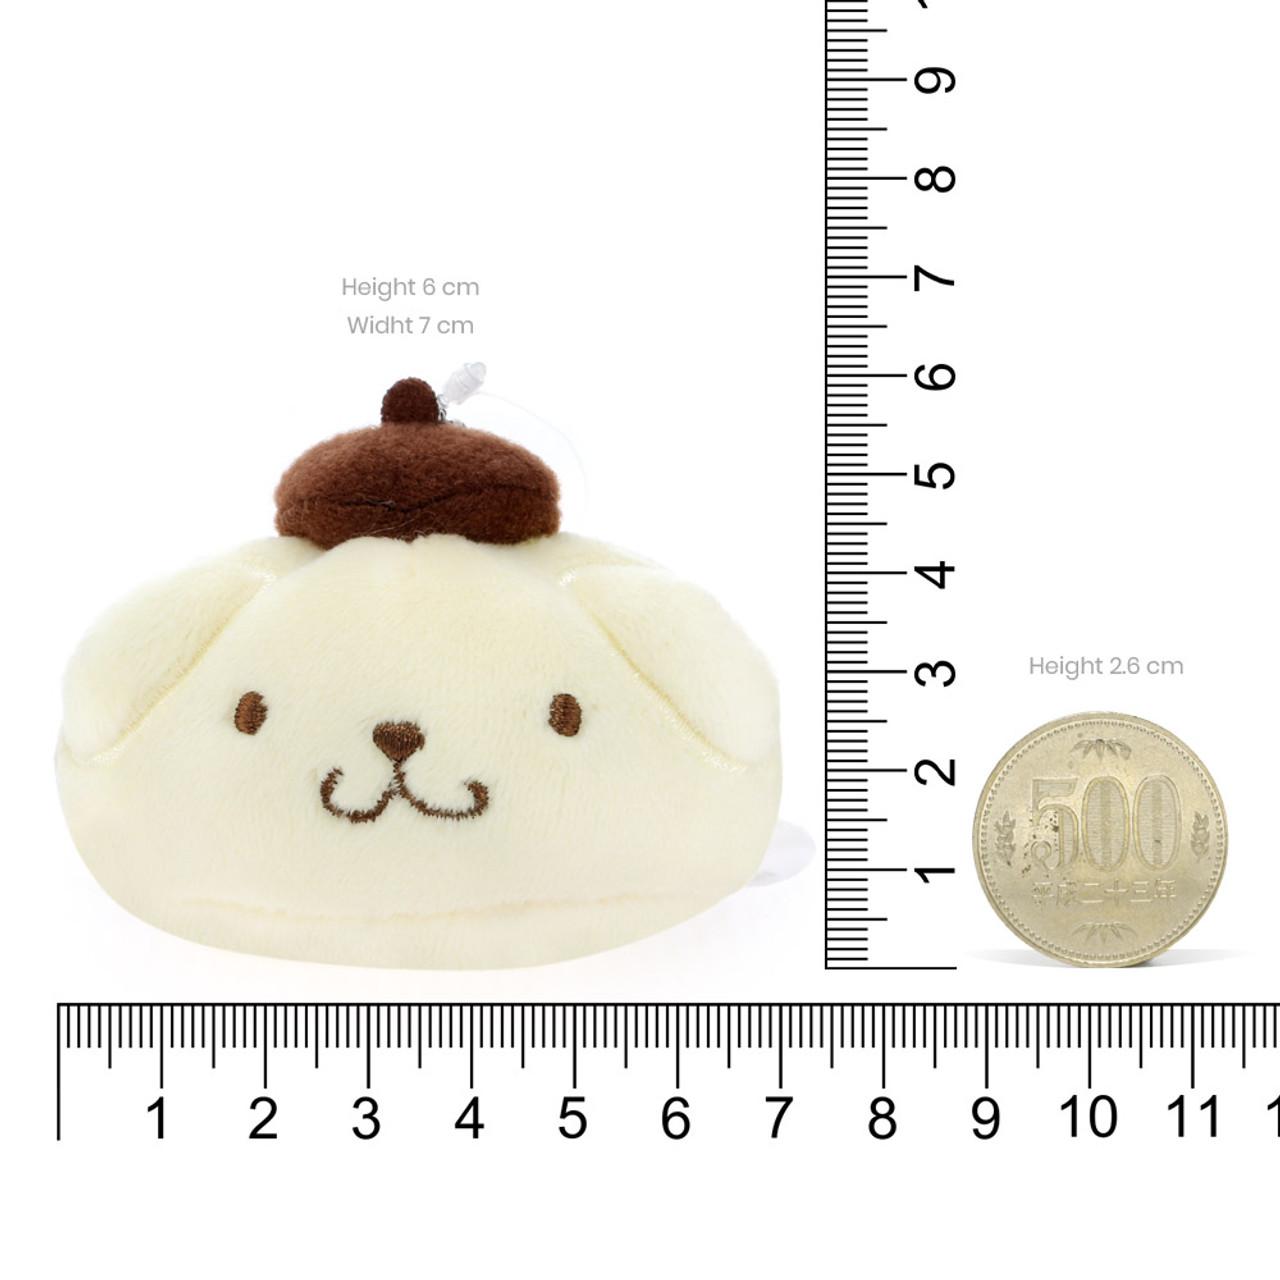 Pompompurin Steamed Buns Mascot Plush Keychain ( Proportion )